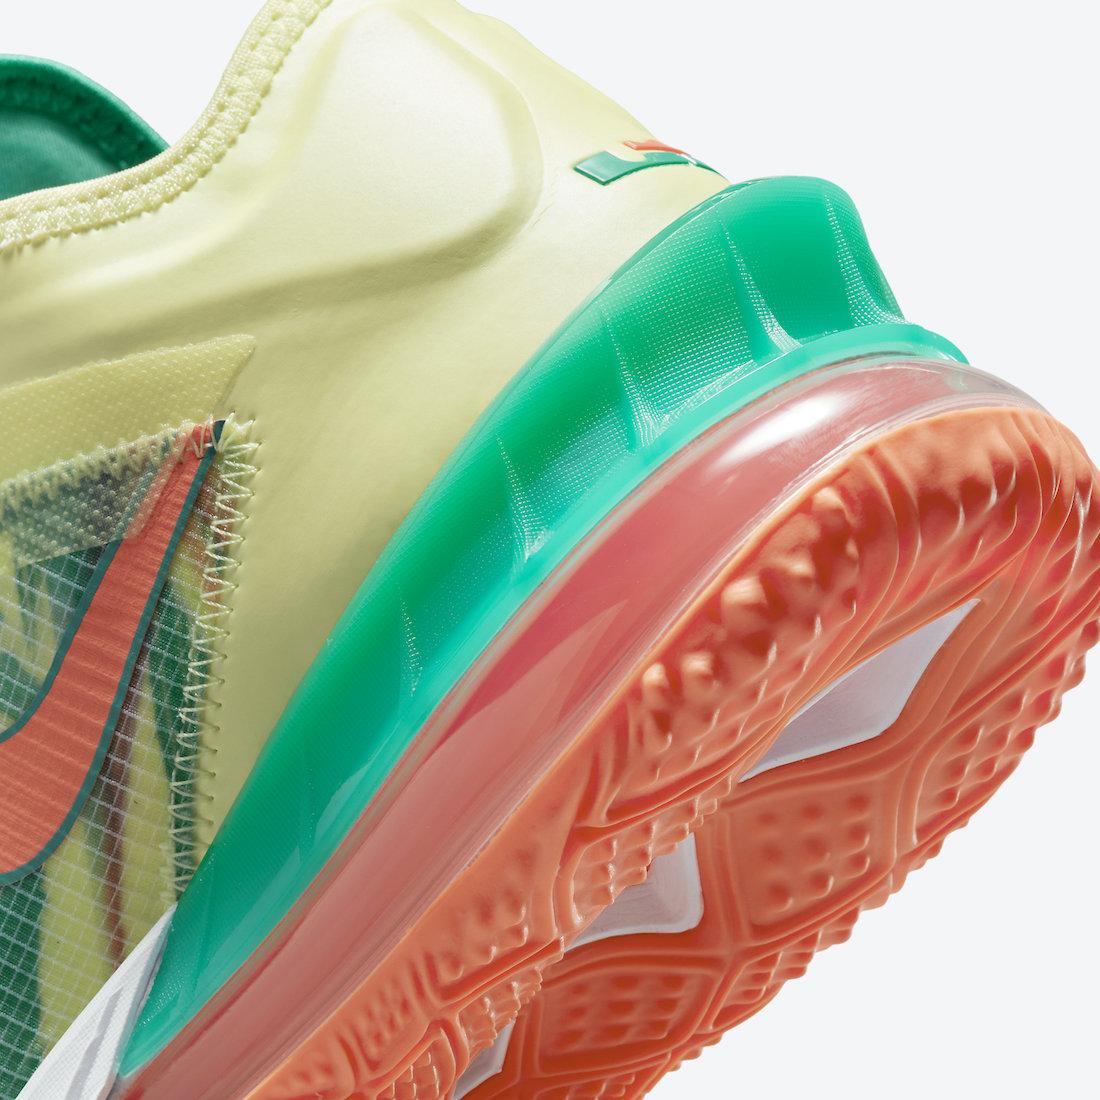 Nike LeBron 18 Low LeBronold Palmer CV7562-300 Release Date